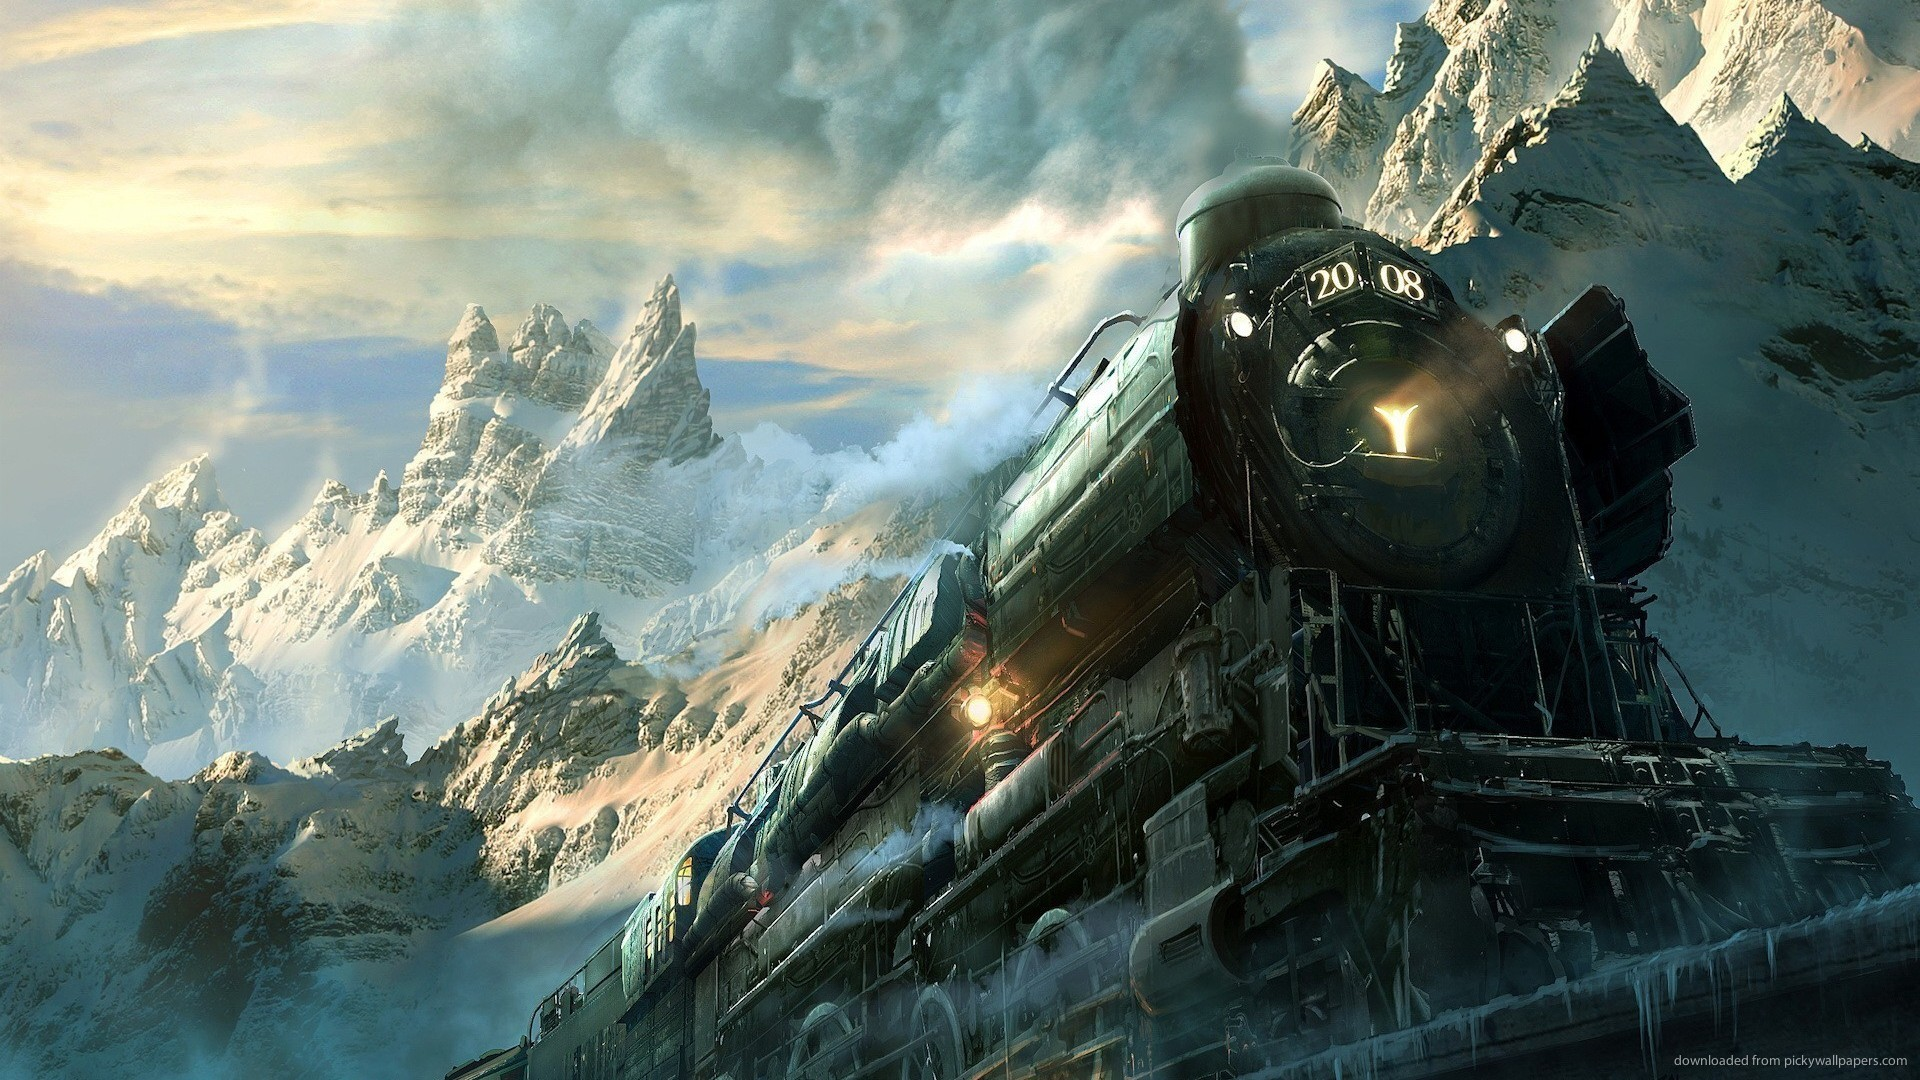 HD Epic Train Art Wallpaper